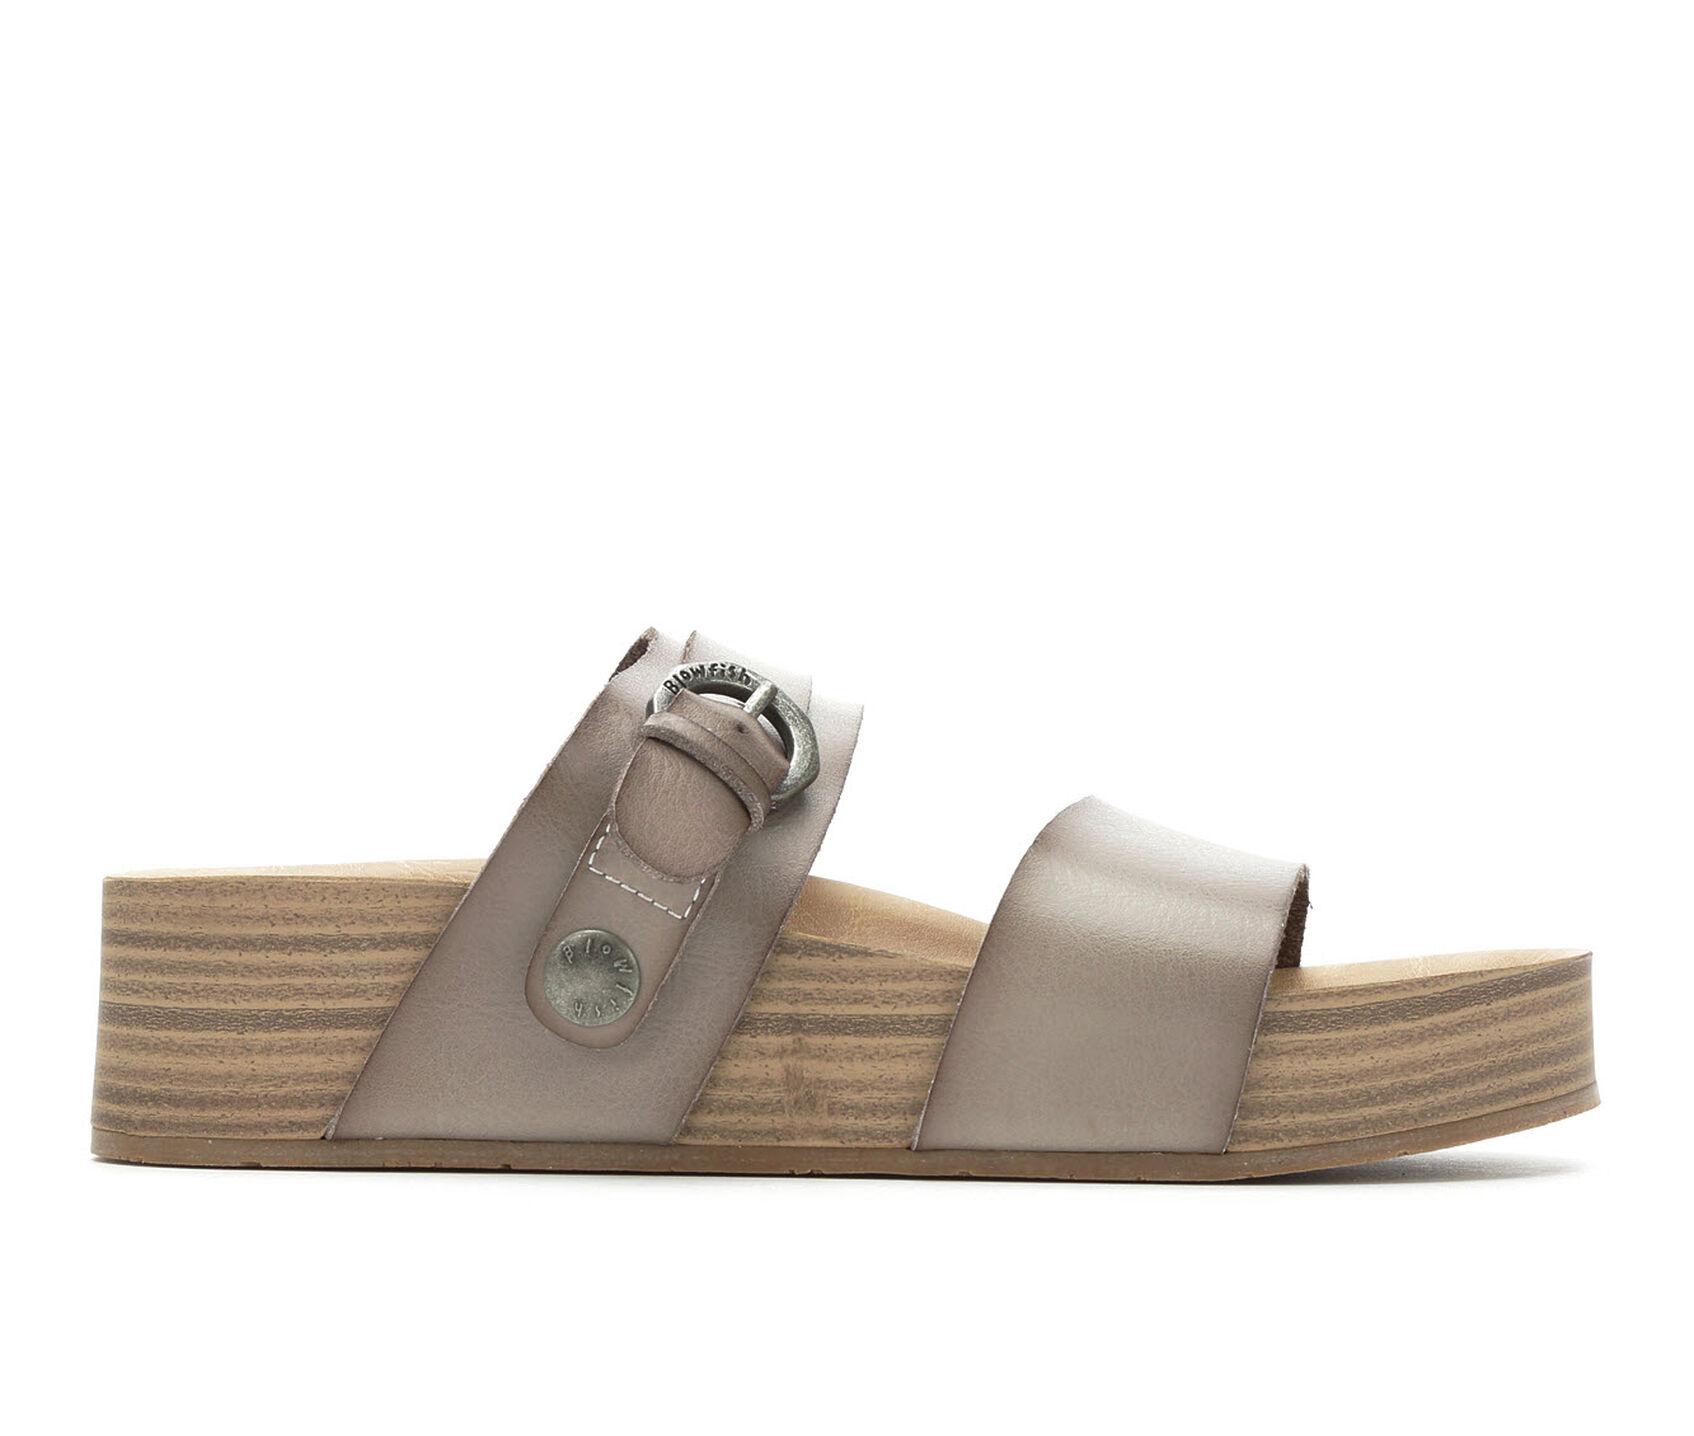 577193368ae3 Women s Blowfish Malibu Marge Flatform Sandals